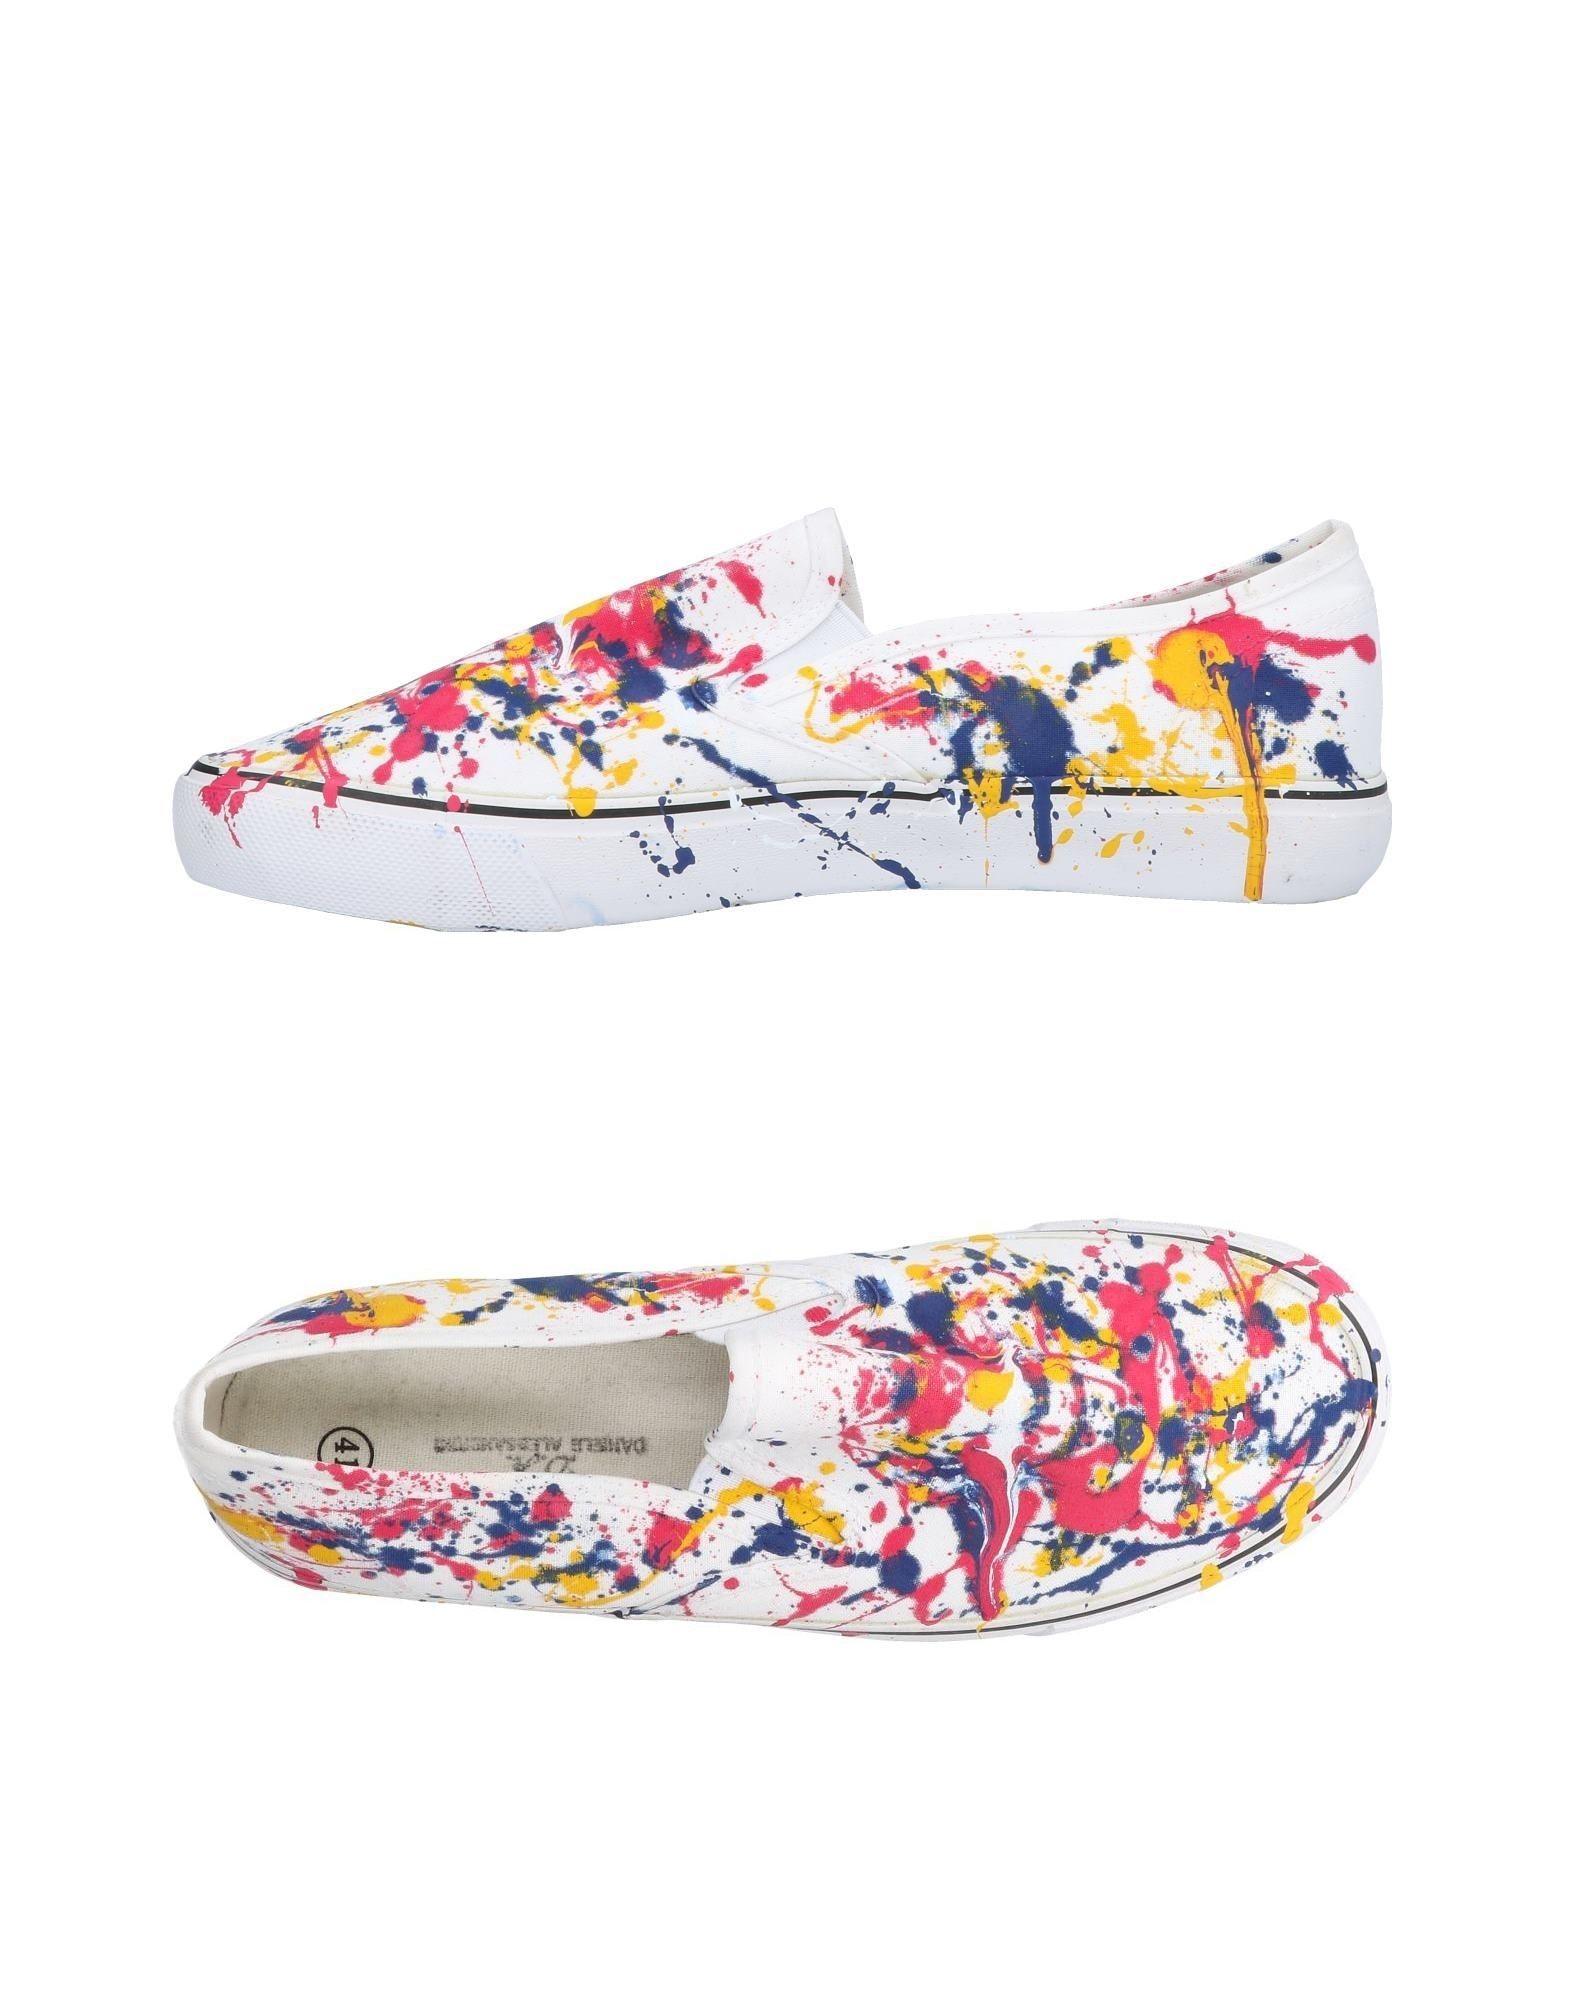 Rabatt echte Schuhe Daniele Alessandrini Sneakers Herren  11422004NO